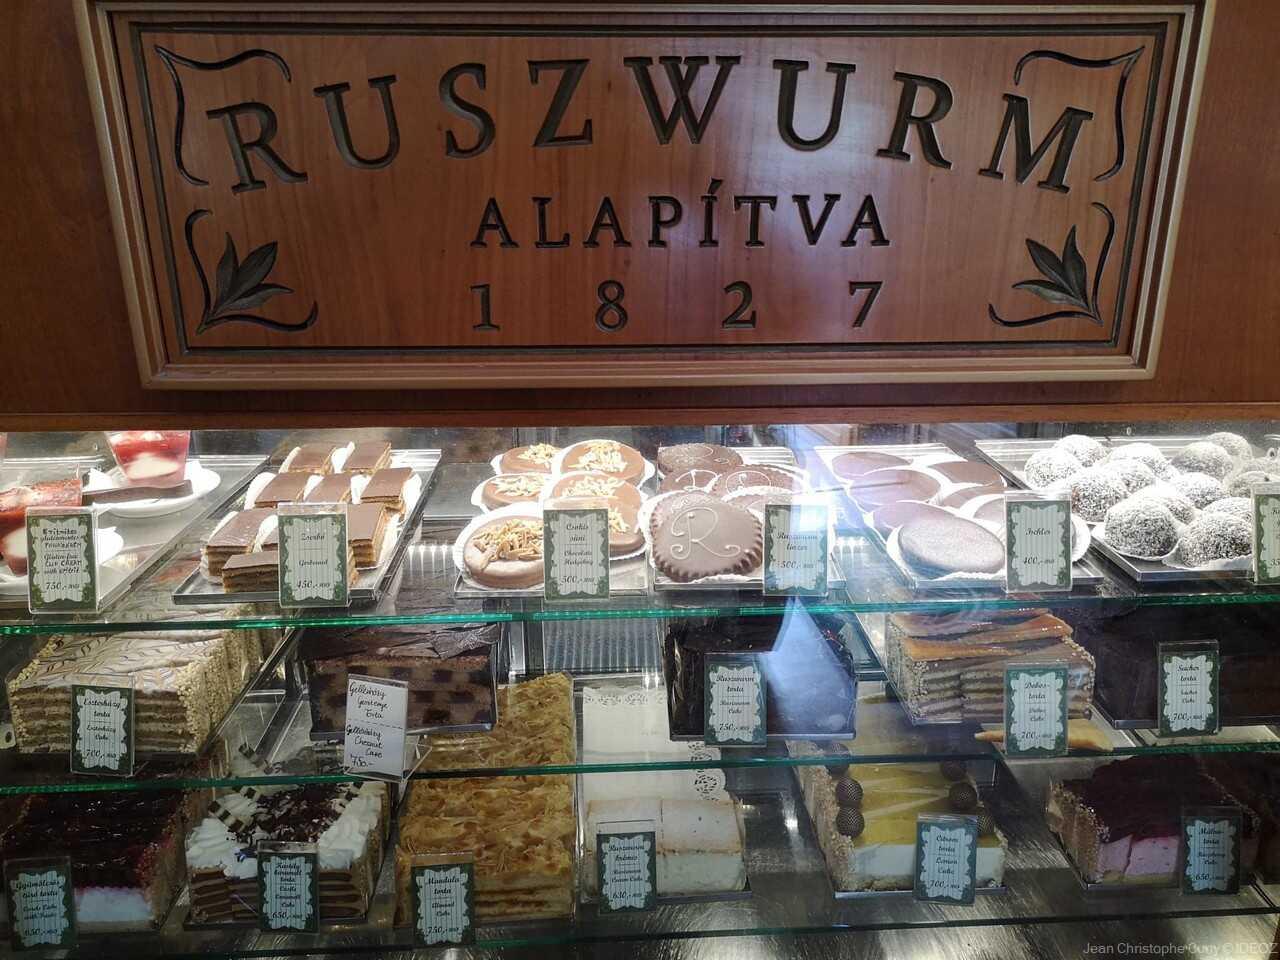 patisseries du salon de thé Ruzswurm alapitva budapest